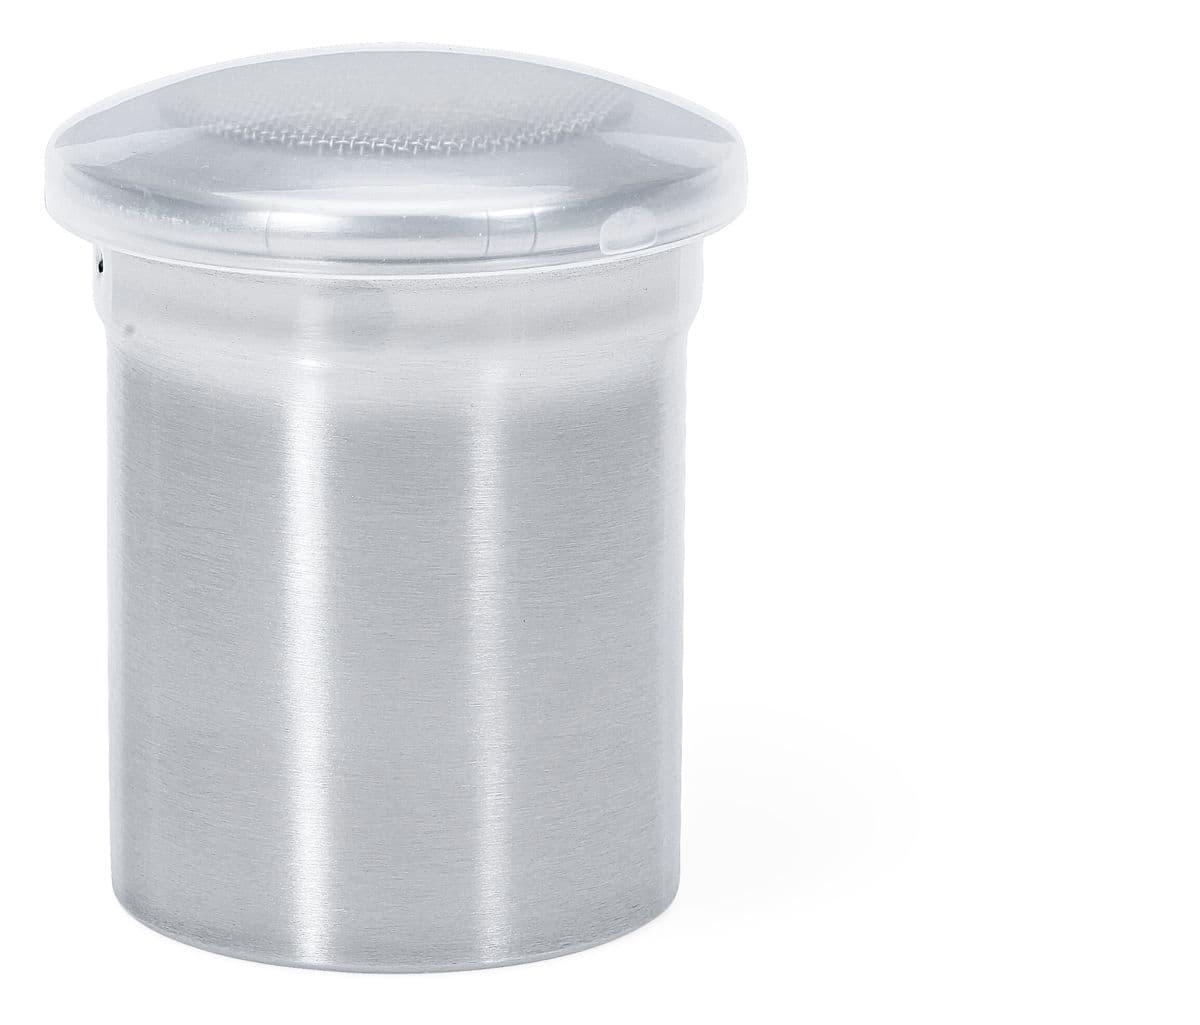 Cucina & Tavola Boîte pour sucre glace